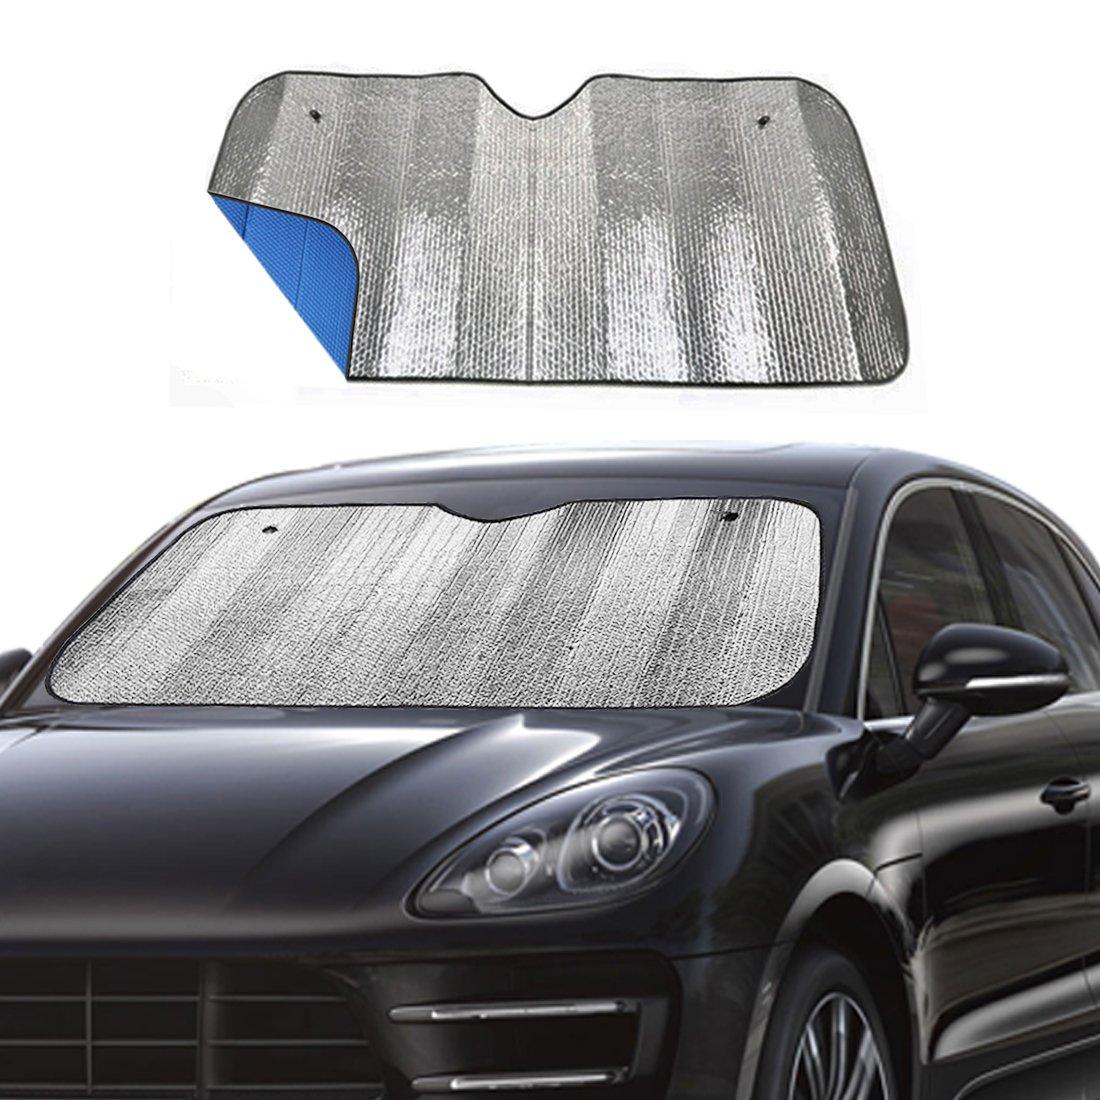 Amazon.com  Big Ant Windshield Sunshade for Car Foldable UV Ray Reflector  Auto Front Window Sun Shade Visor Shield Cover 4048ead63ed